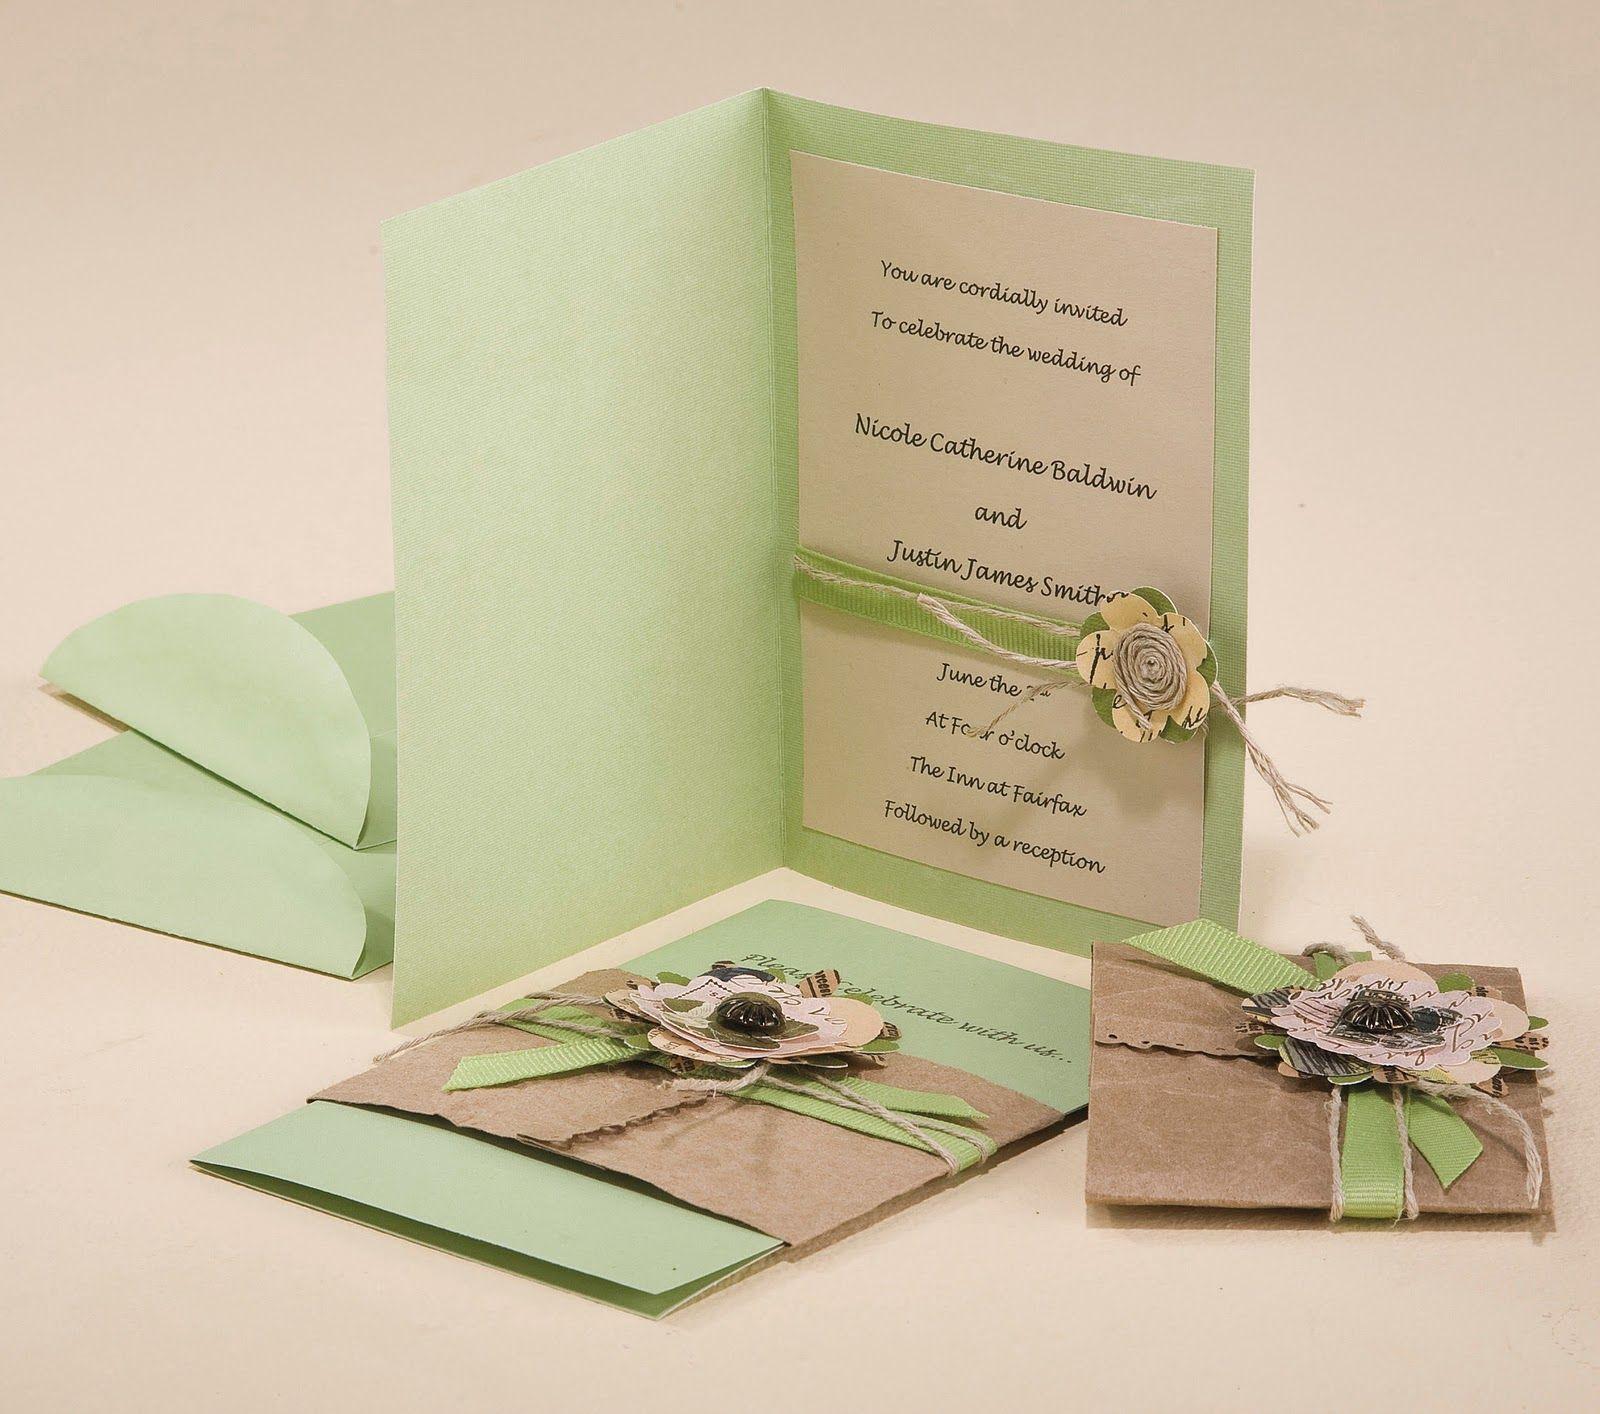 diseño de tarjetas para bodas gratis - Buscar con Google | Mi boda ...